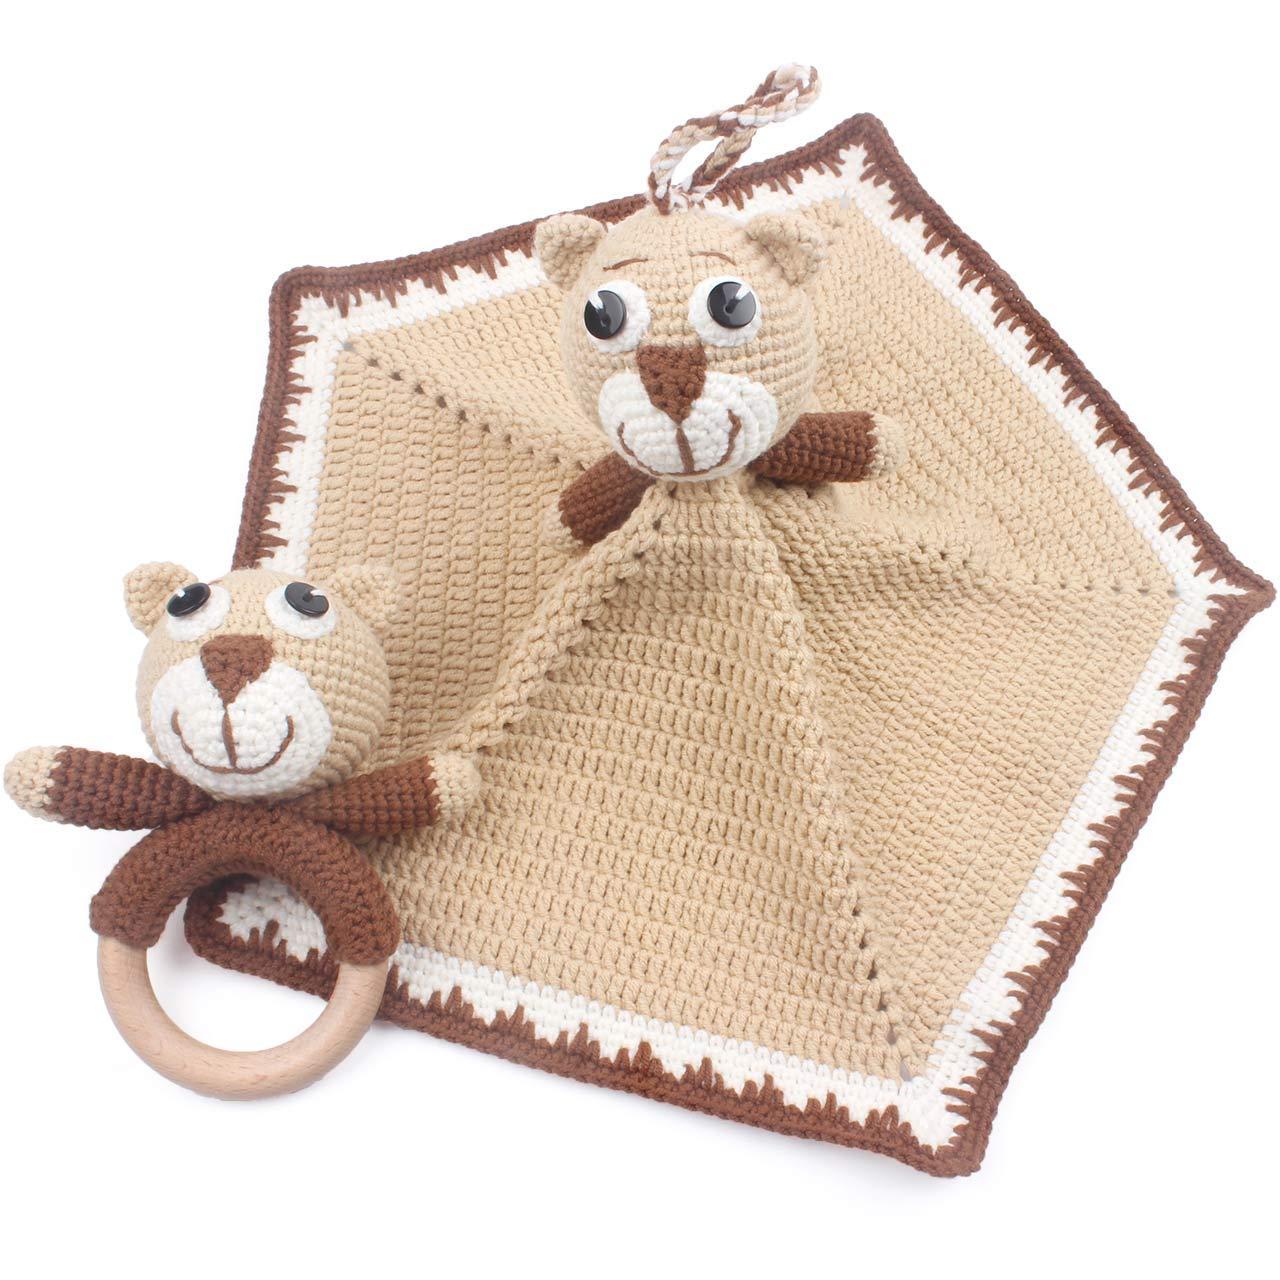 Cuddly Teddy Bear Crochet Baby Blanket Pattern   AllFreeCrochet.com   1280x1280